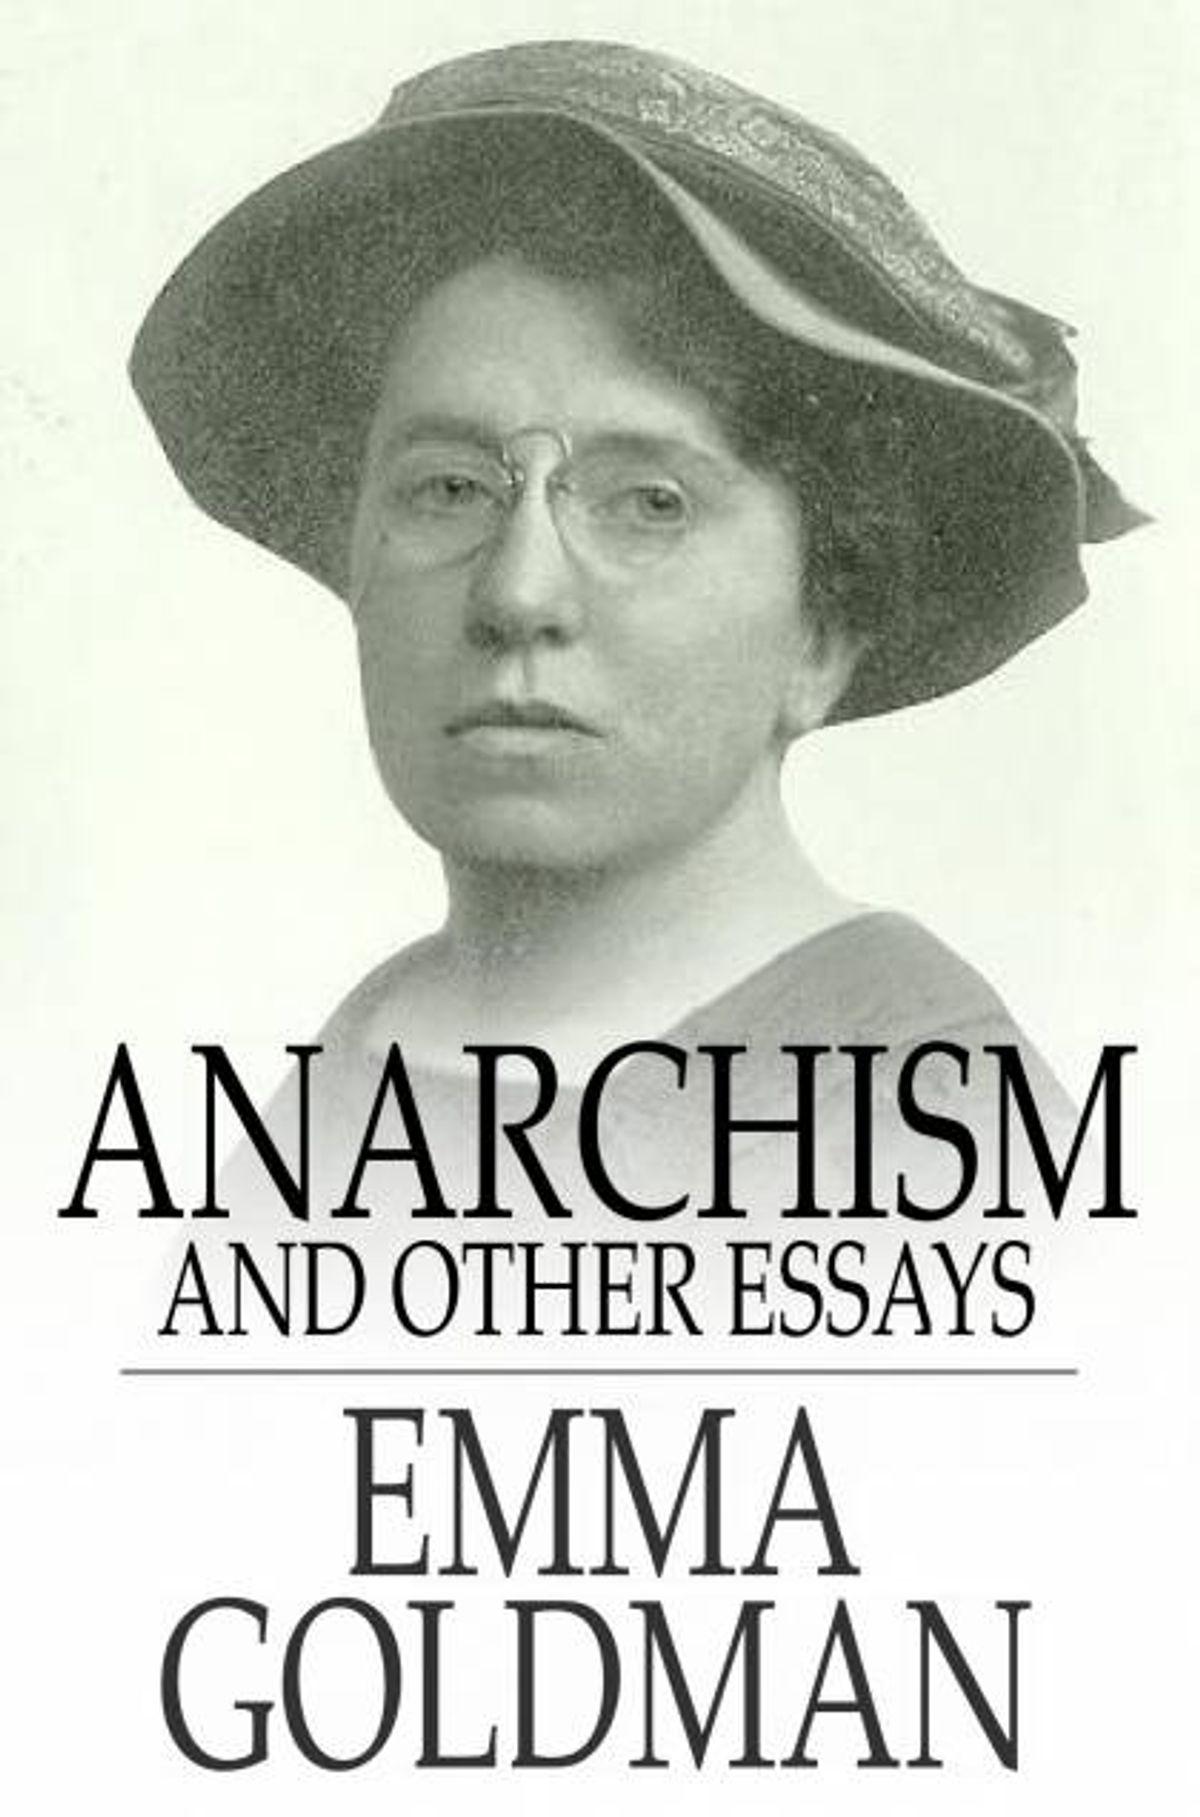 009 Anarchism And Other Essays Essay Incredible Emma Goldman Summary Pdf Full